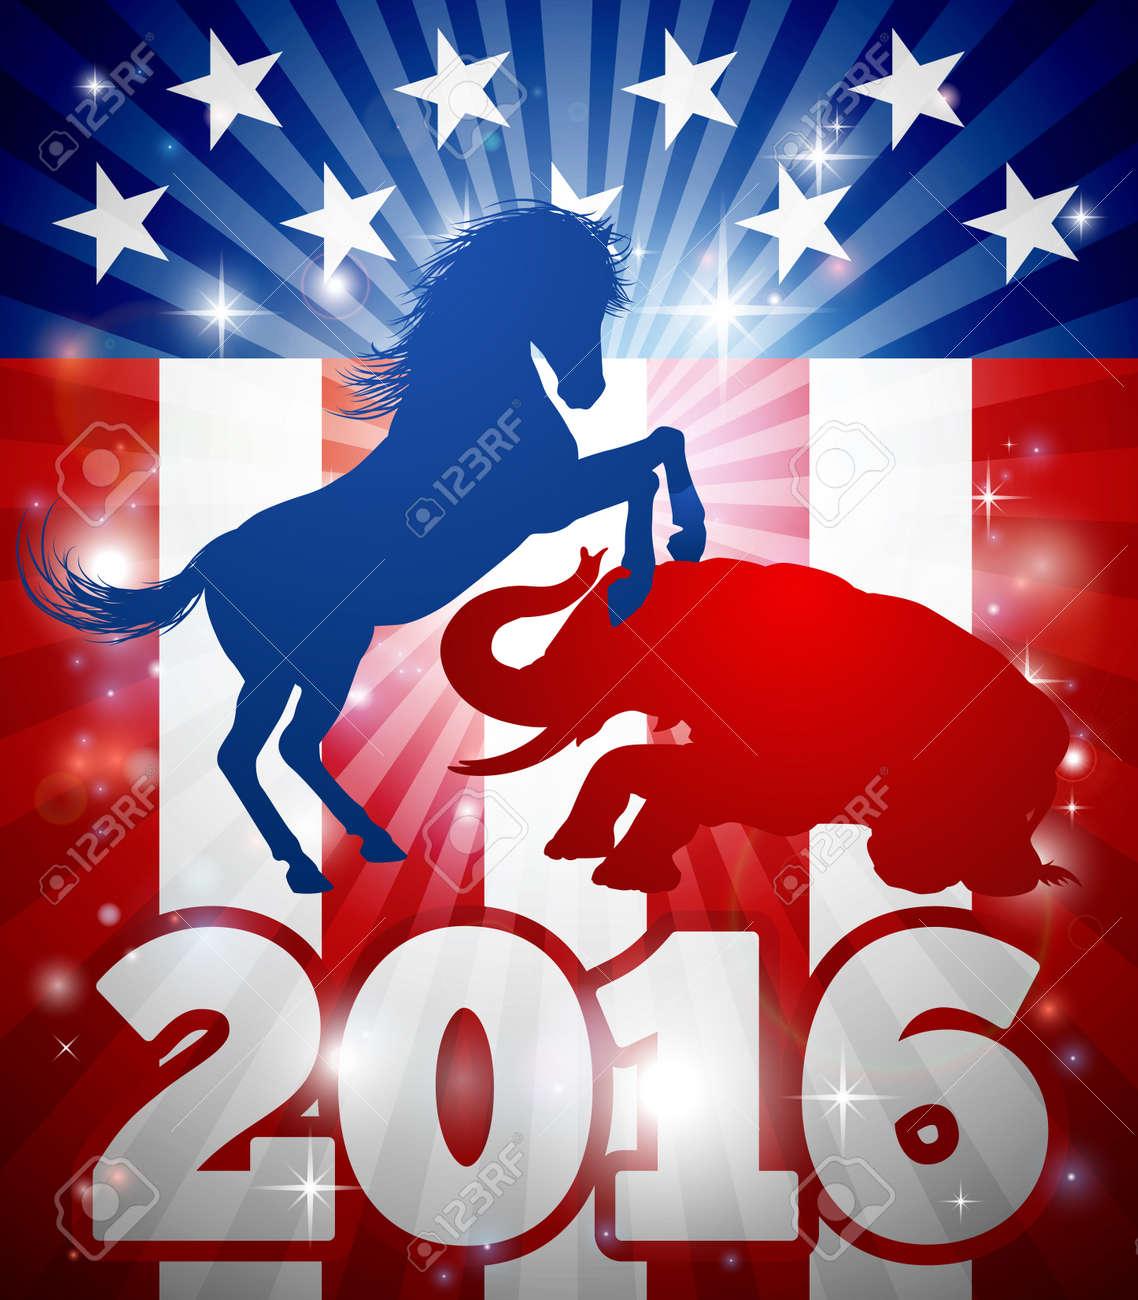 Mascot animals of american democratic and republican parties mascot animals of american democratic and republican parties blue donkey and red elephant in silhouette buycottarizona